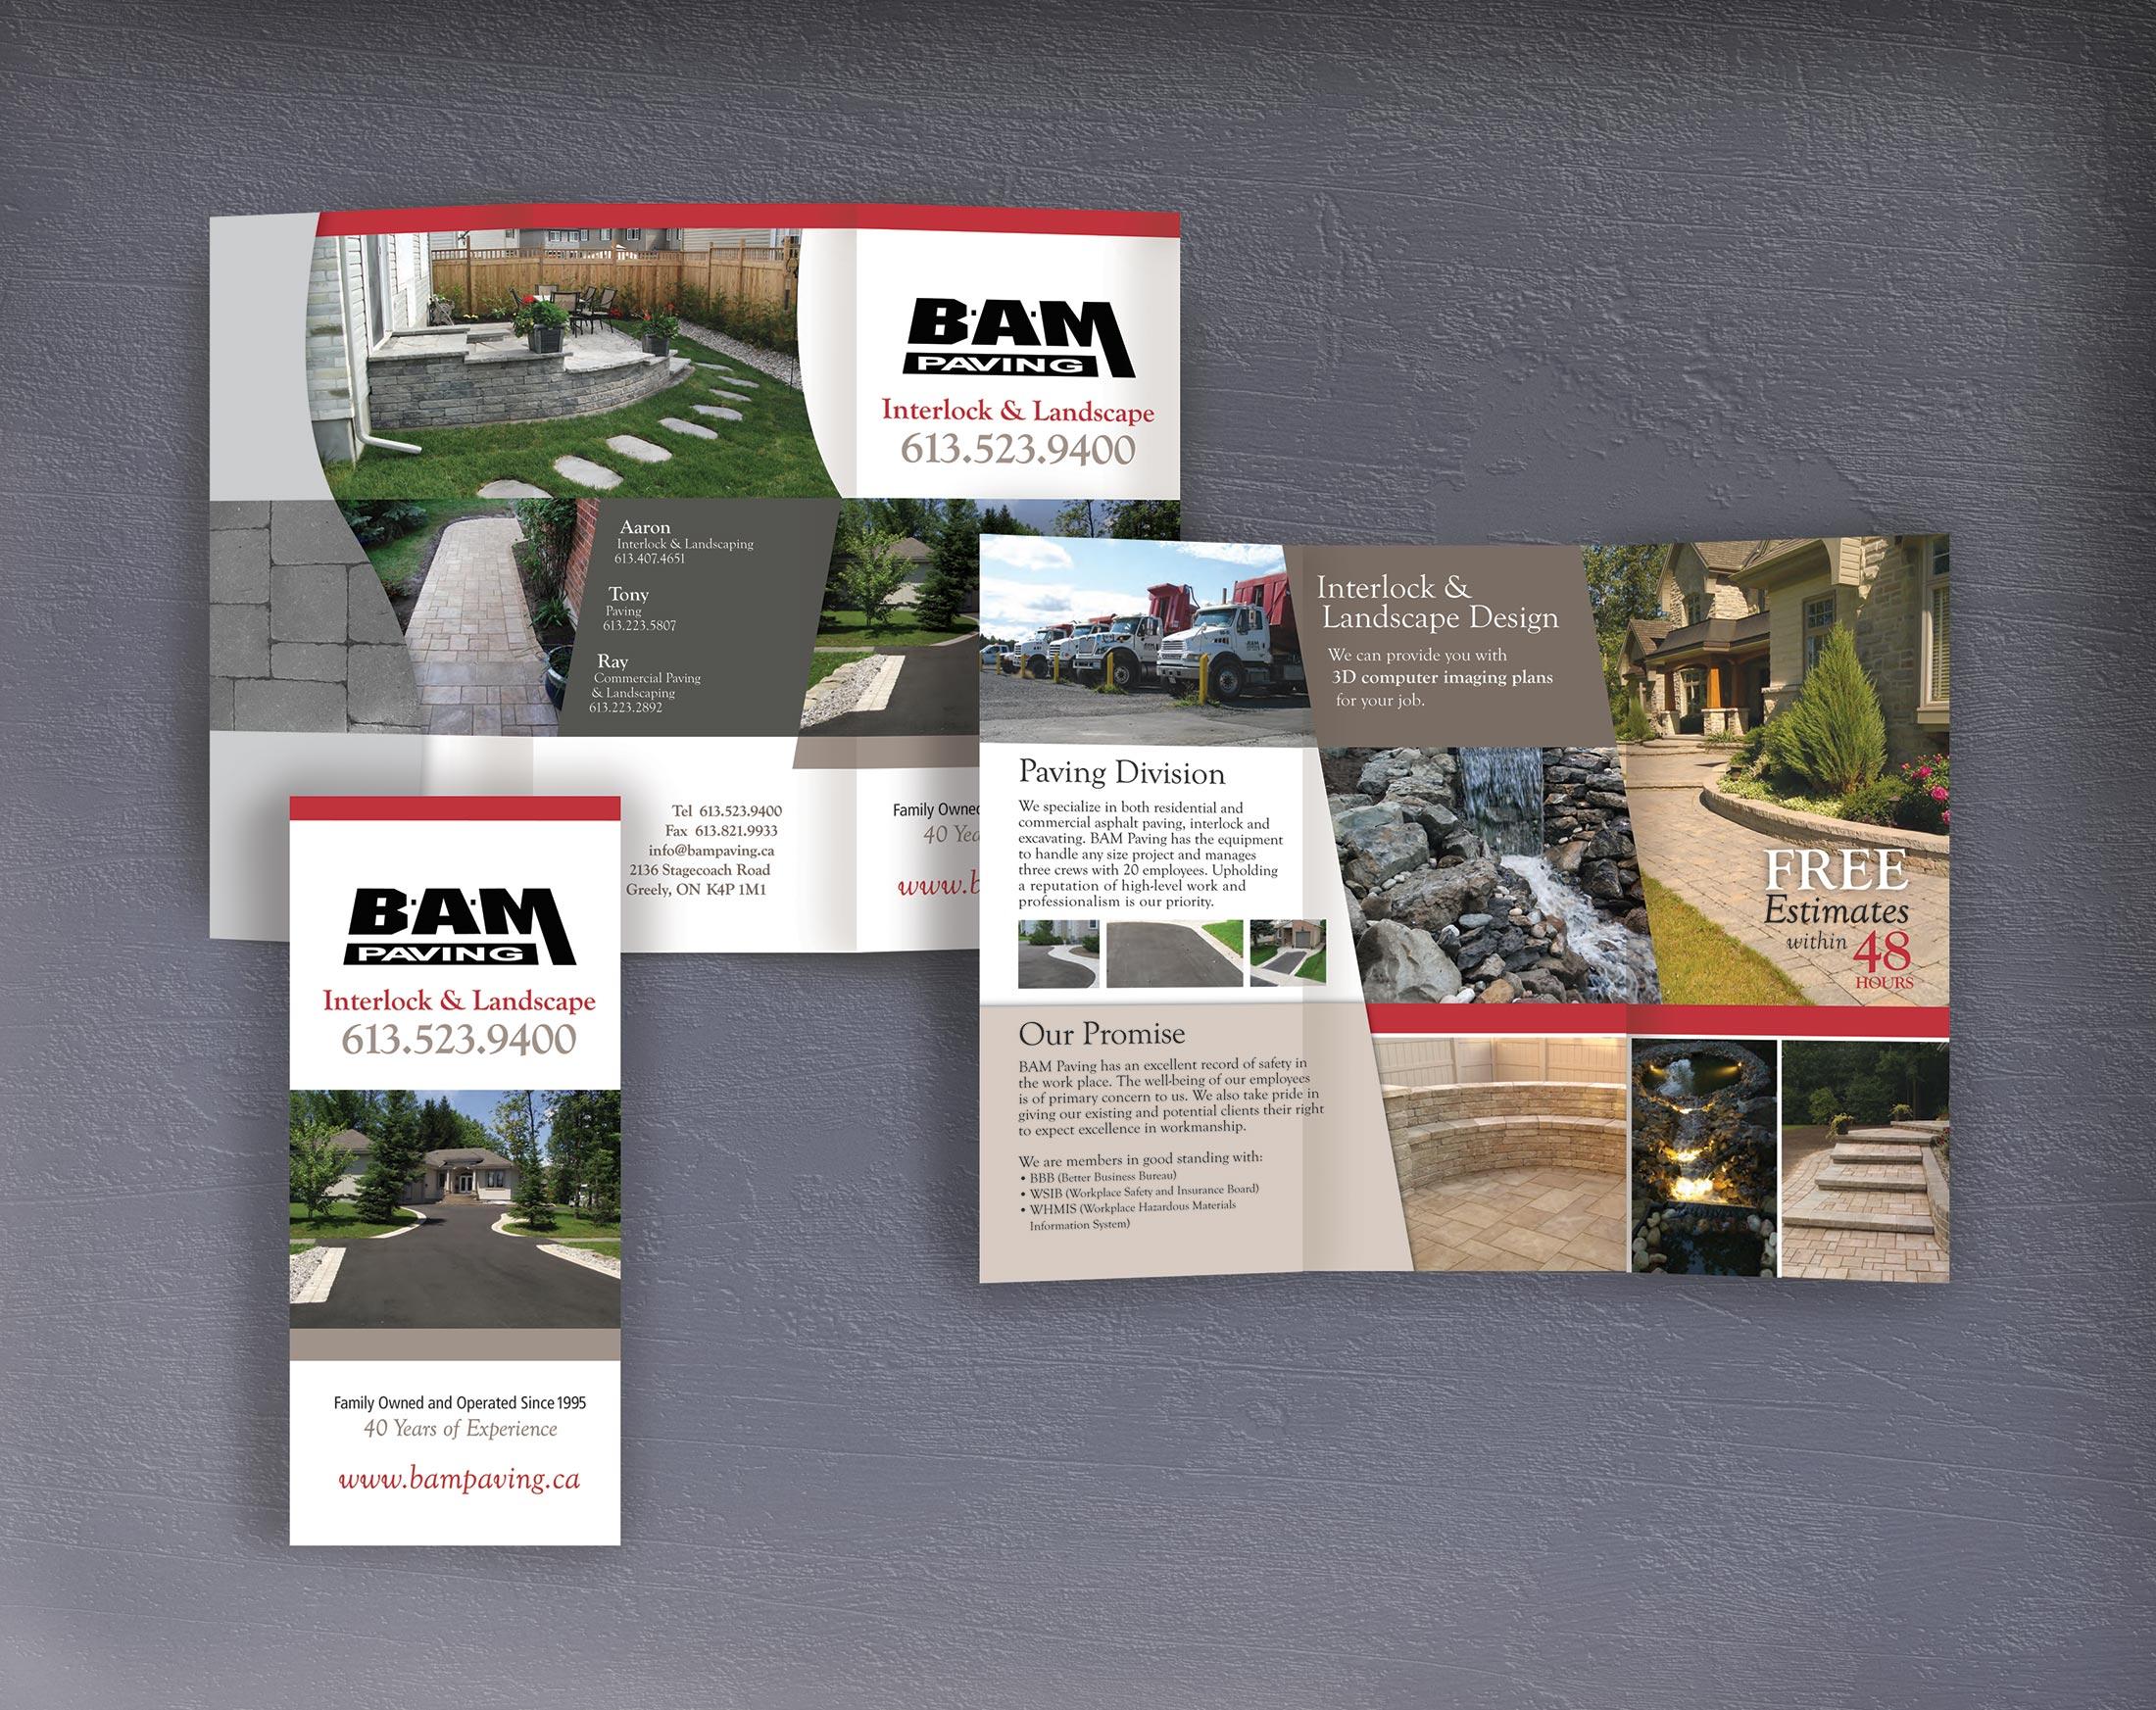 BAM-brochure